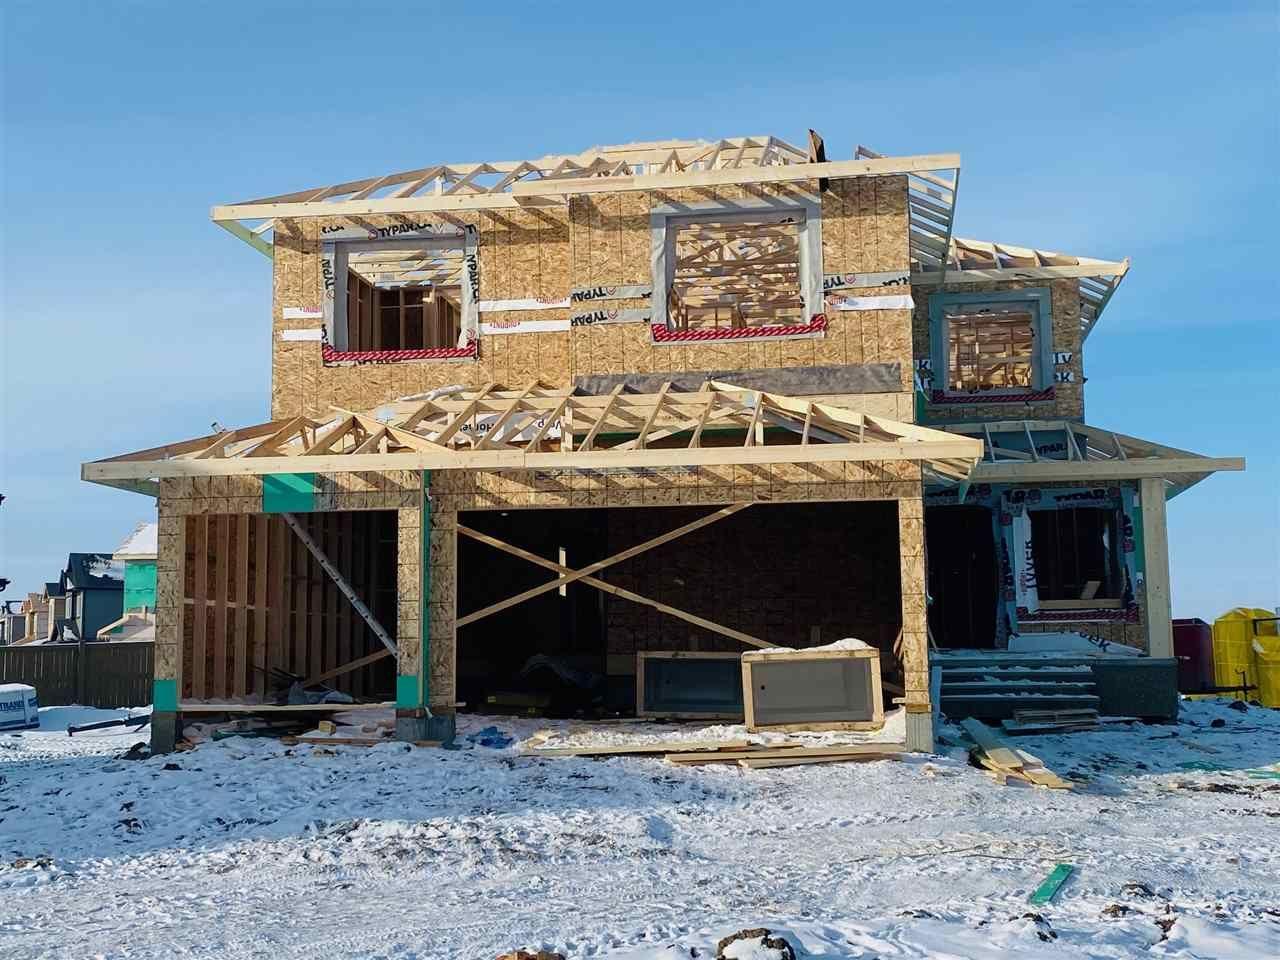 Main Photo: 17936 59 Street in Edmonton: Zone 03 House for sale : MLS®# E4228370